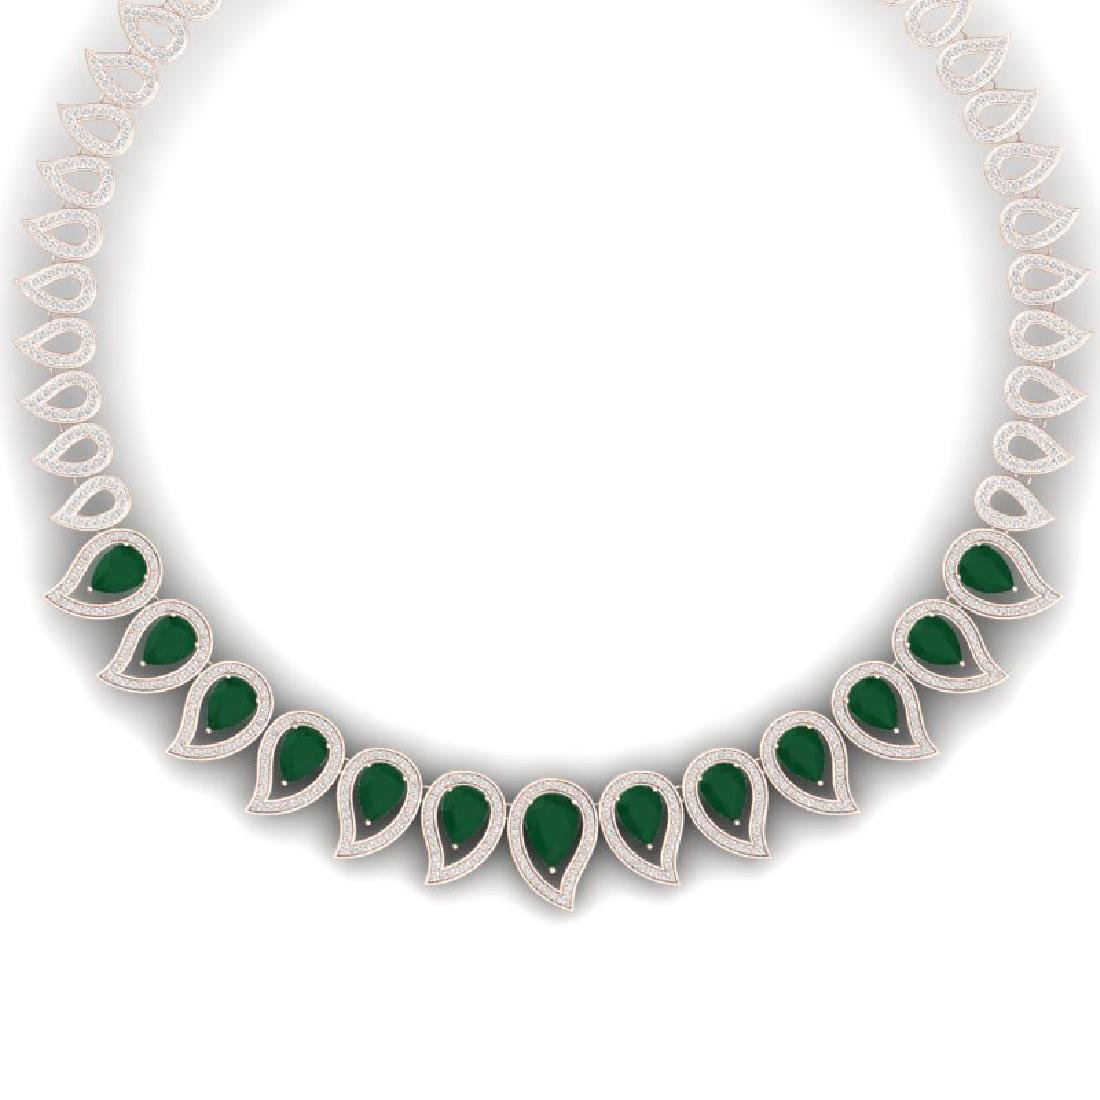 33.4 CTW Royalty Emerald & VS Diamond Necklace 18K Rose